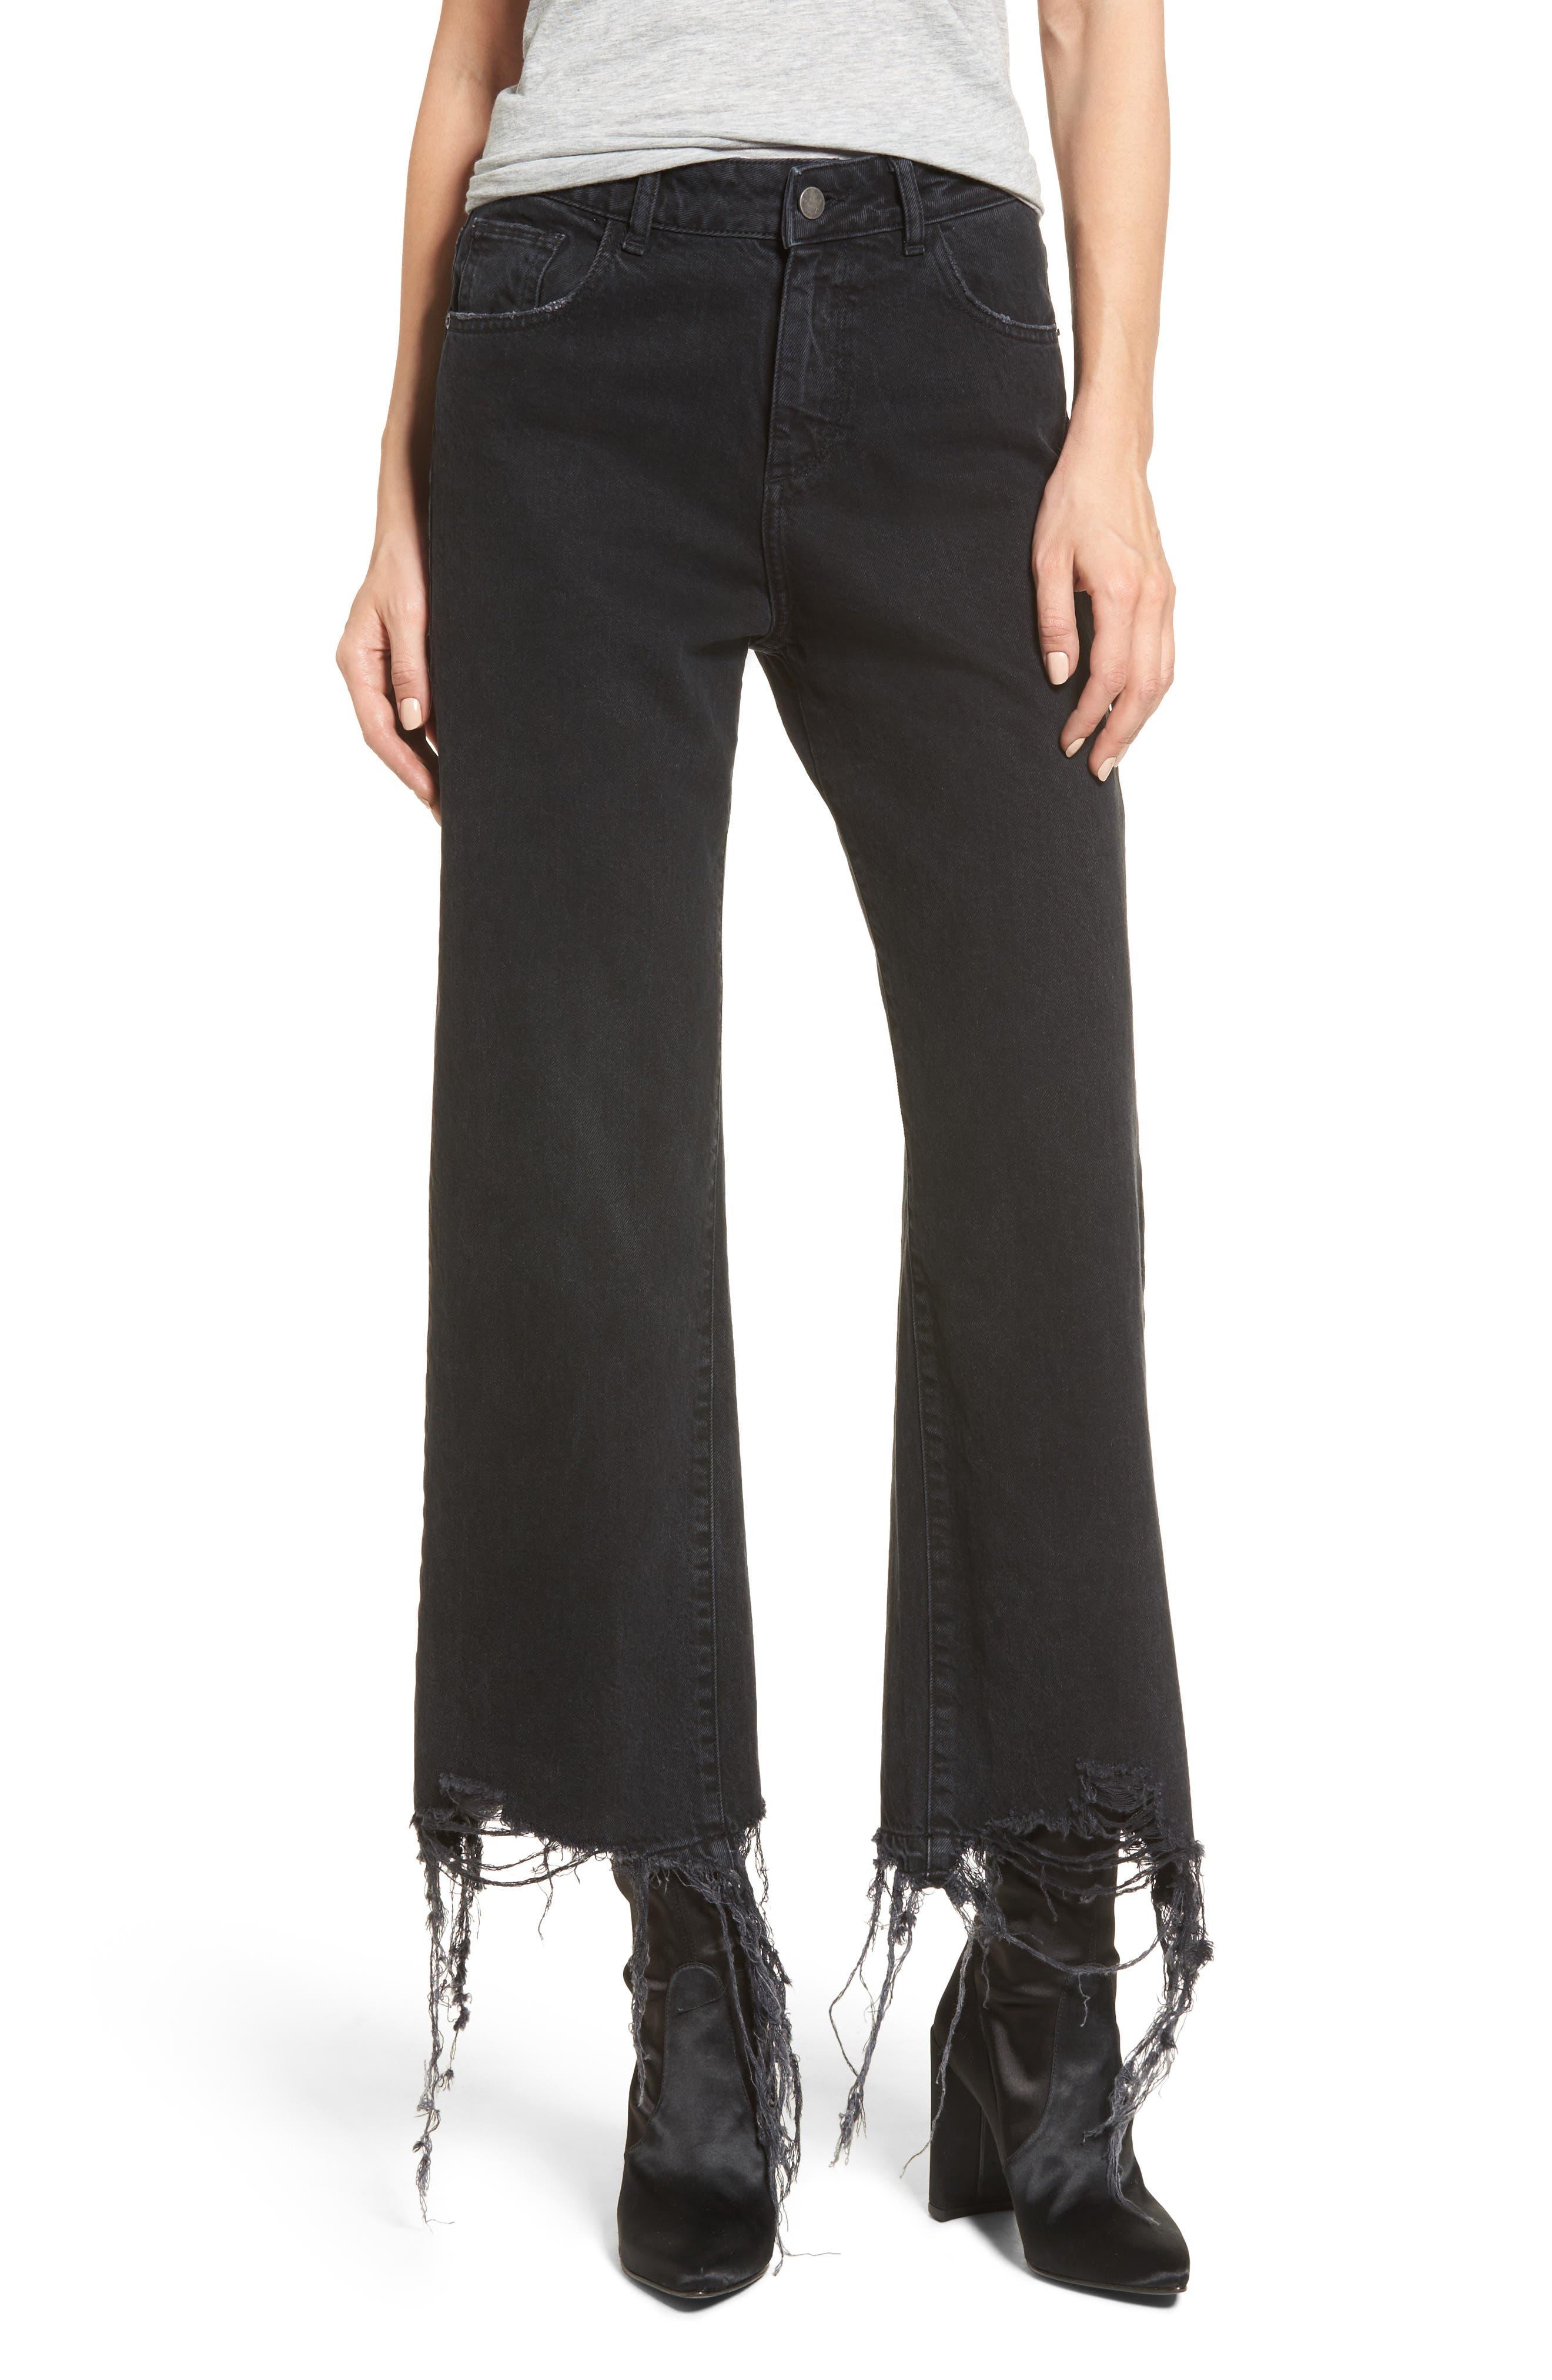 Hepburn High Waist Wide Leg Jeans,                         Main,                         color, Savannah Destroy